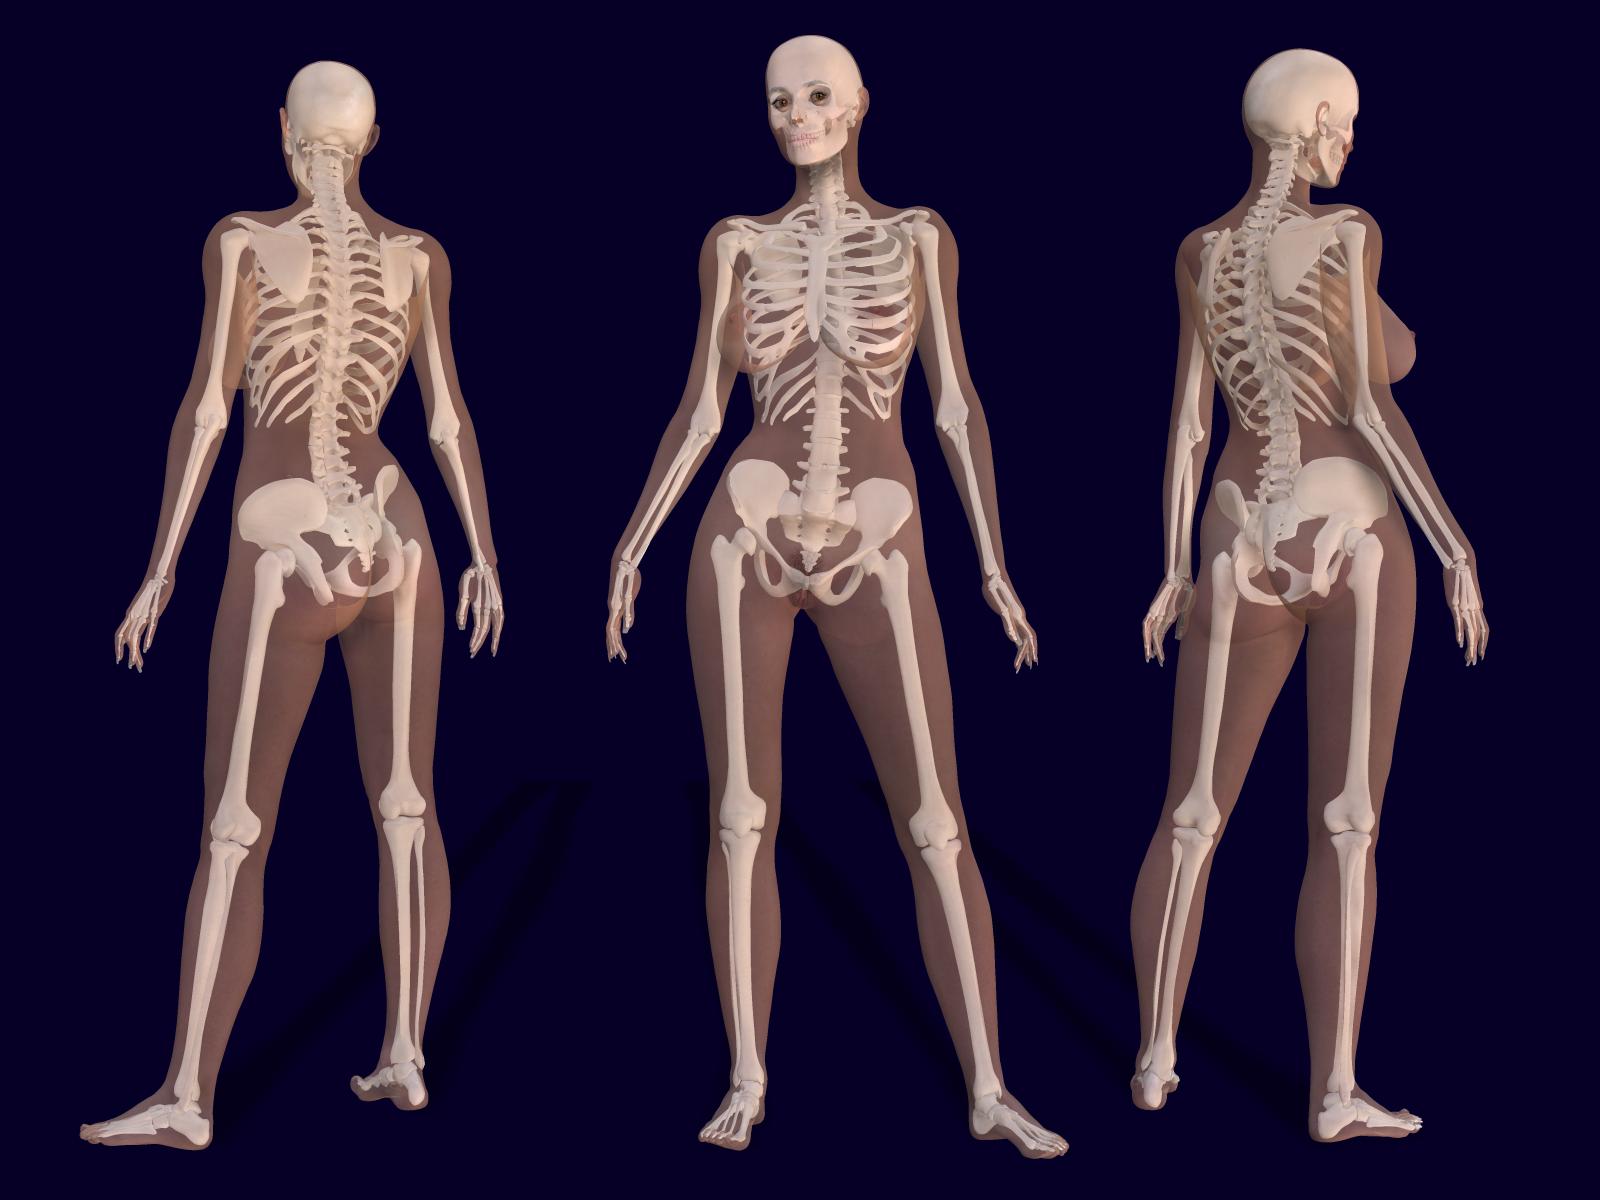 The female skeleton diagram | Skeletons | Know Your Meme